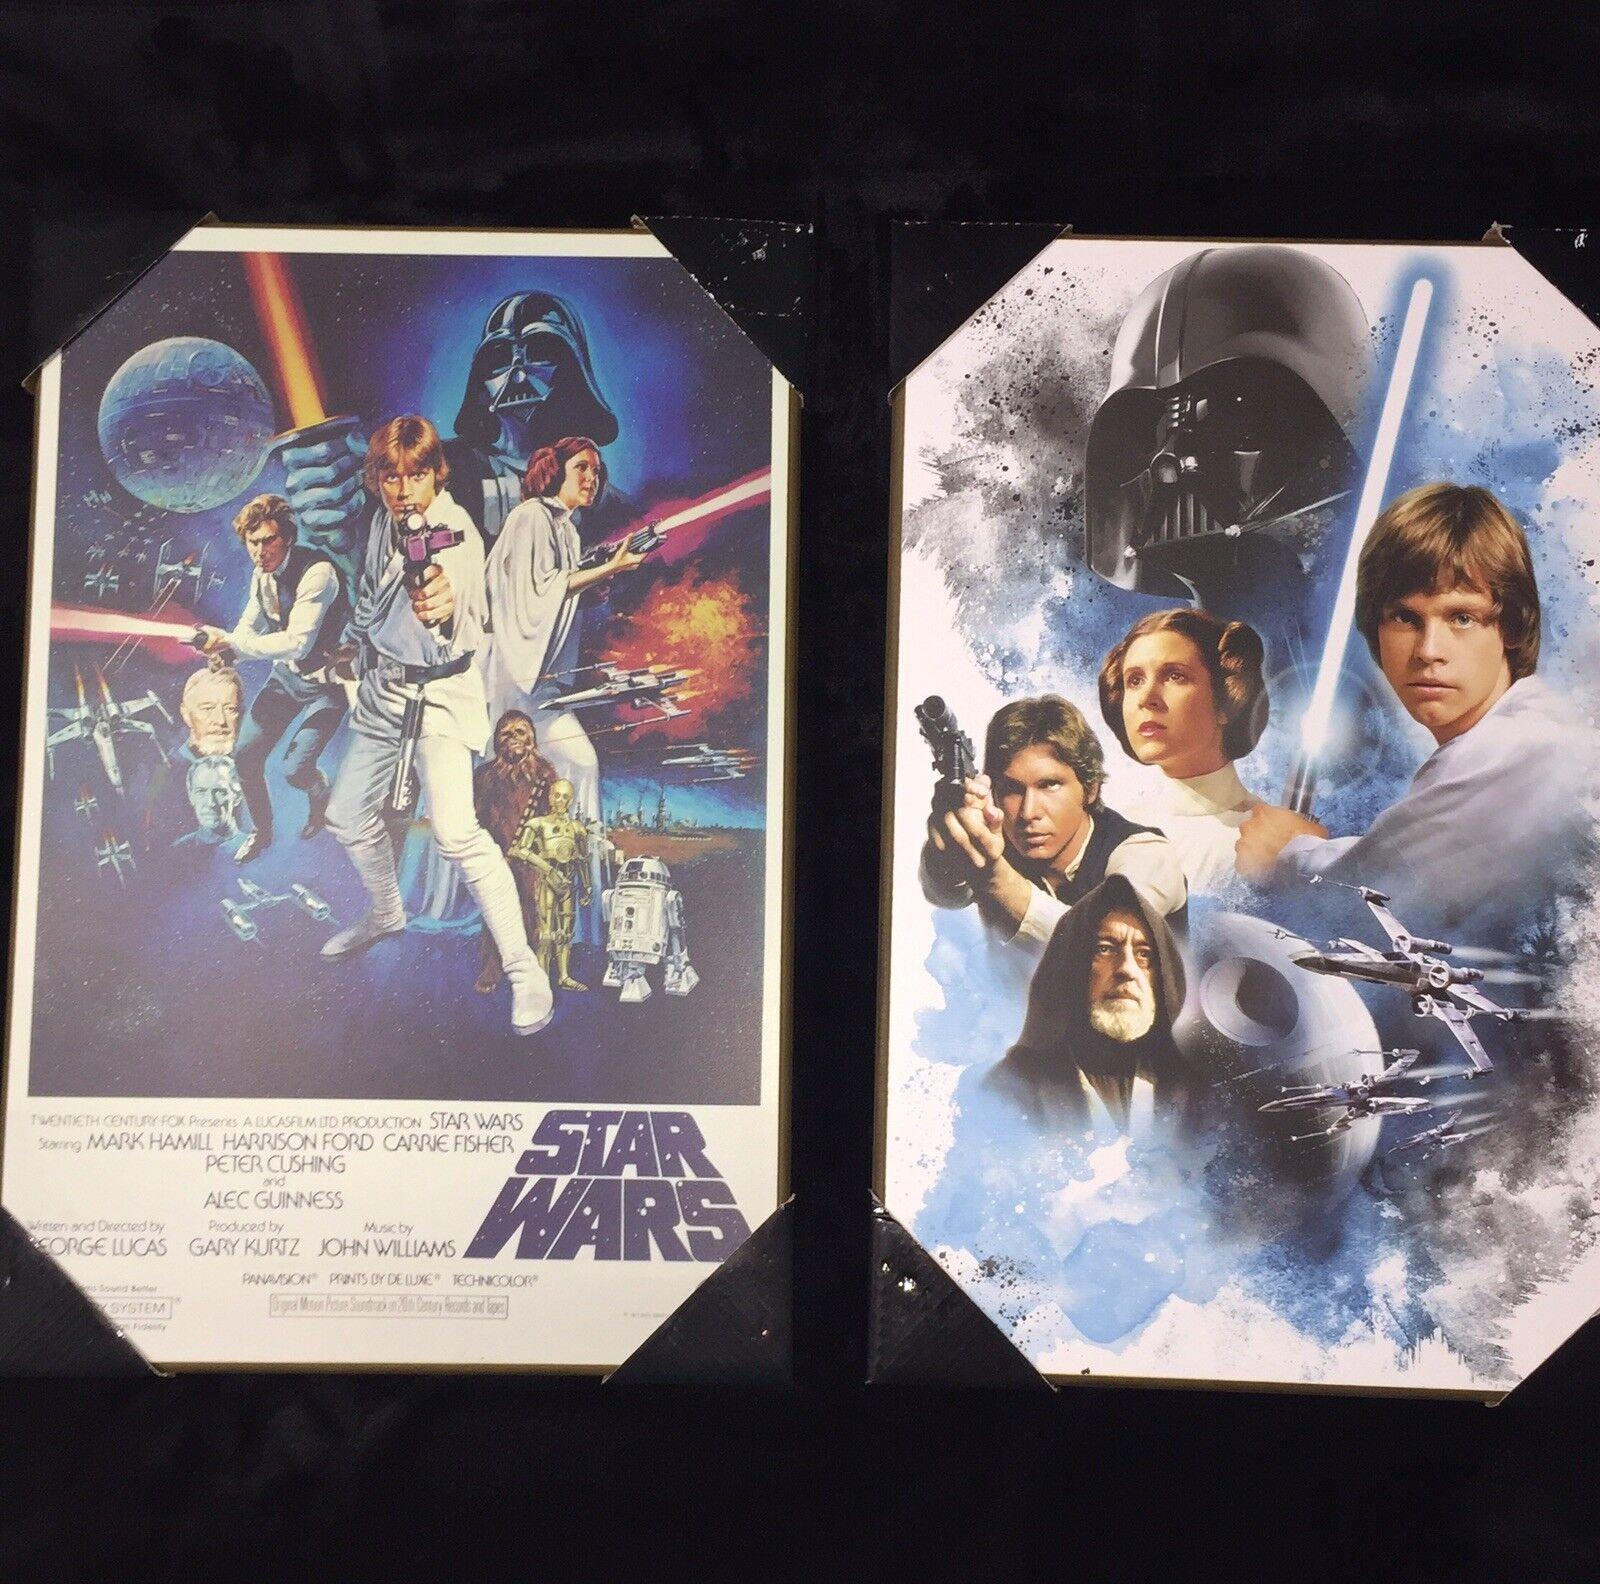 """RARE"" 1977 Star Wars Wooden Wall Art Plaque"